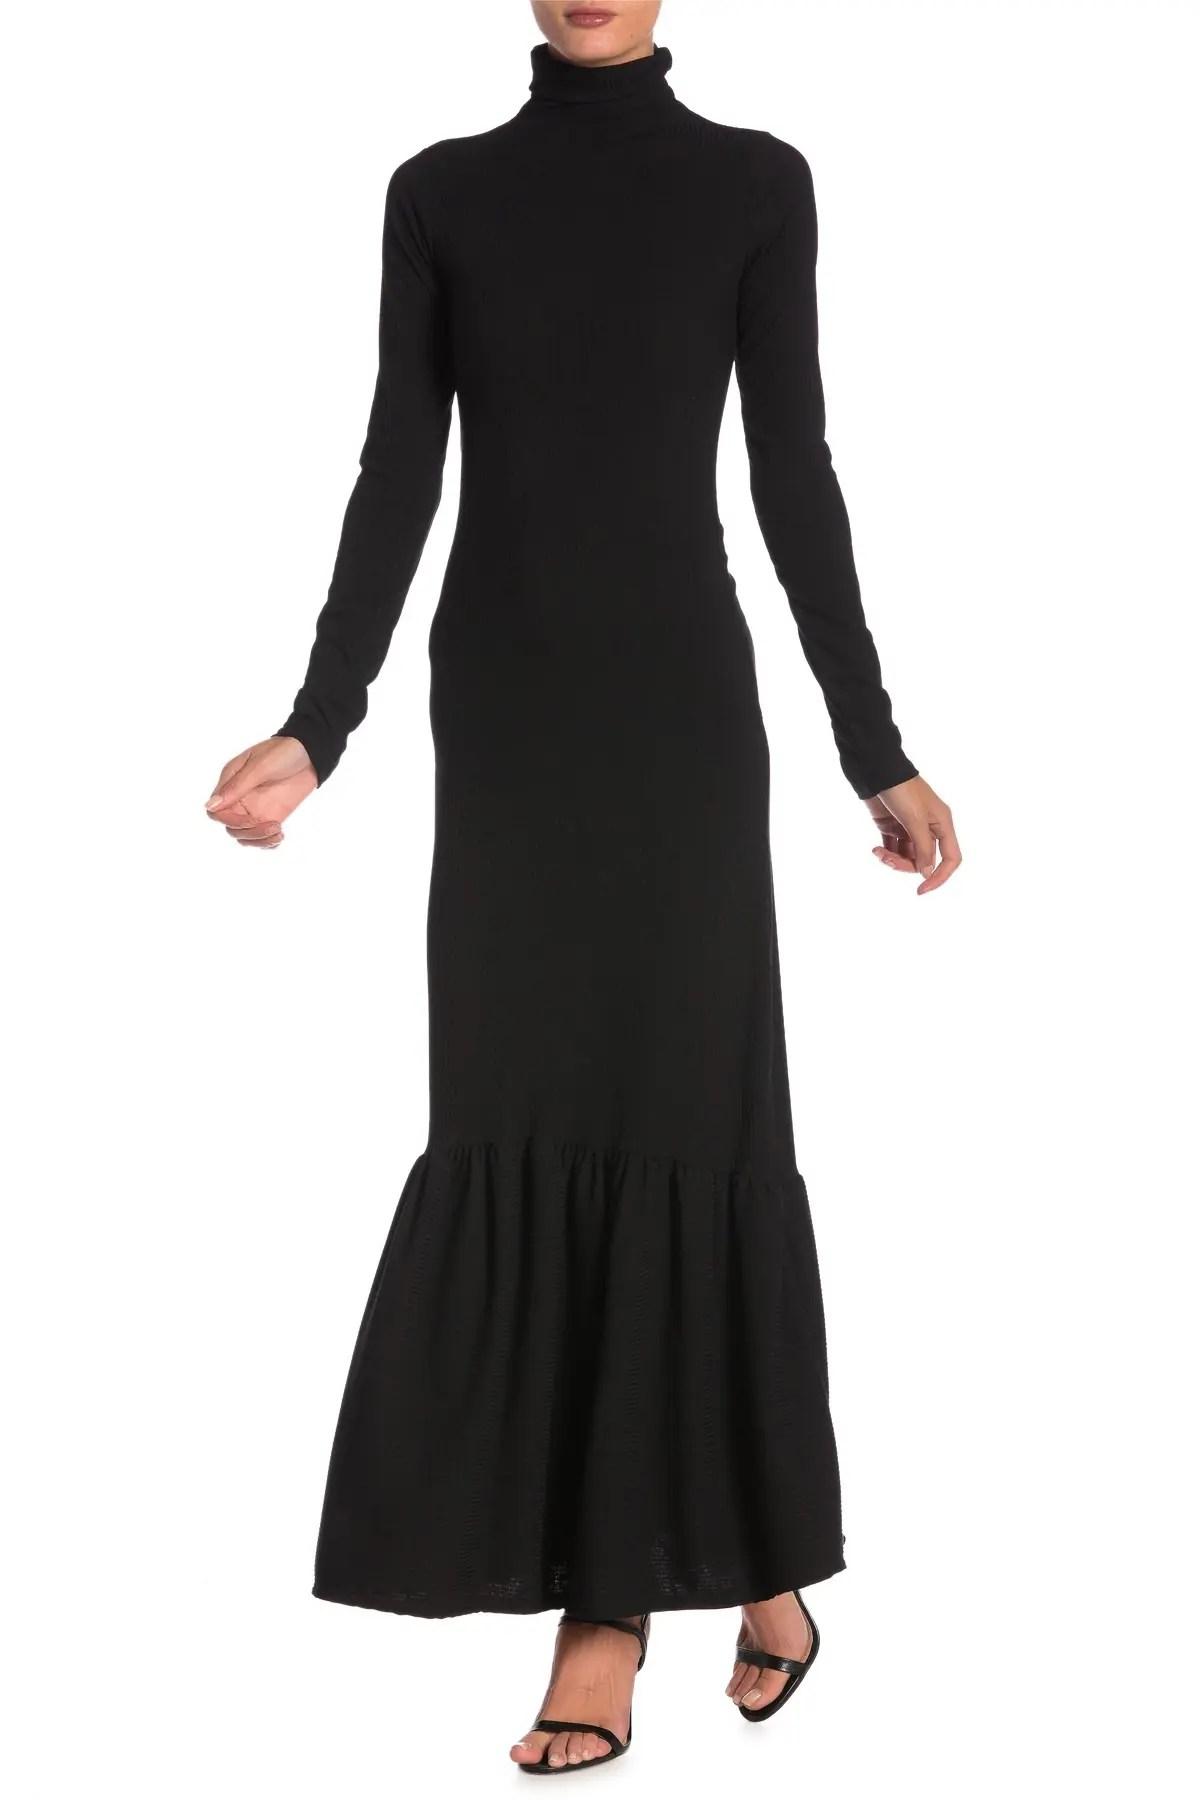 go couture long sleeve turtleneck maxi dress nordstrom rack